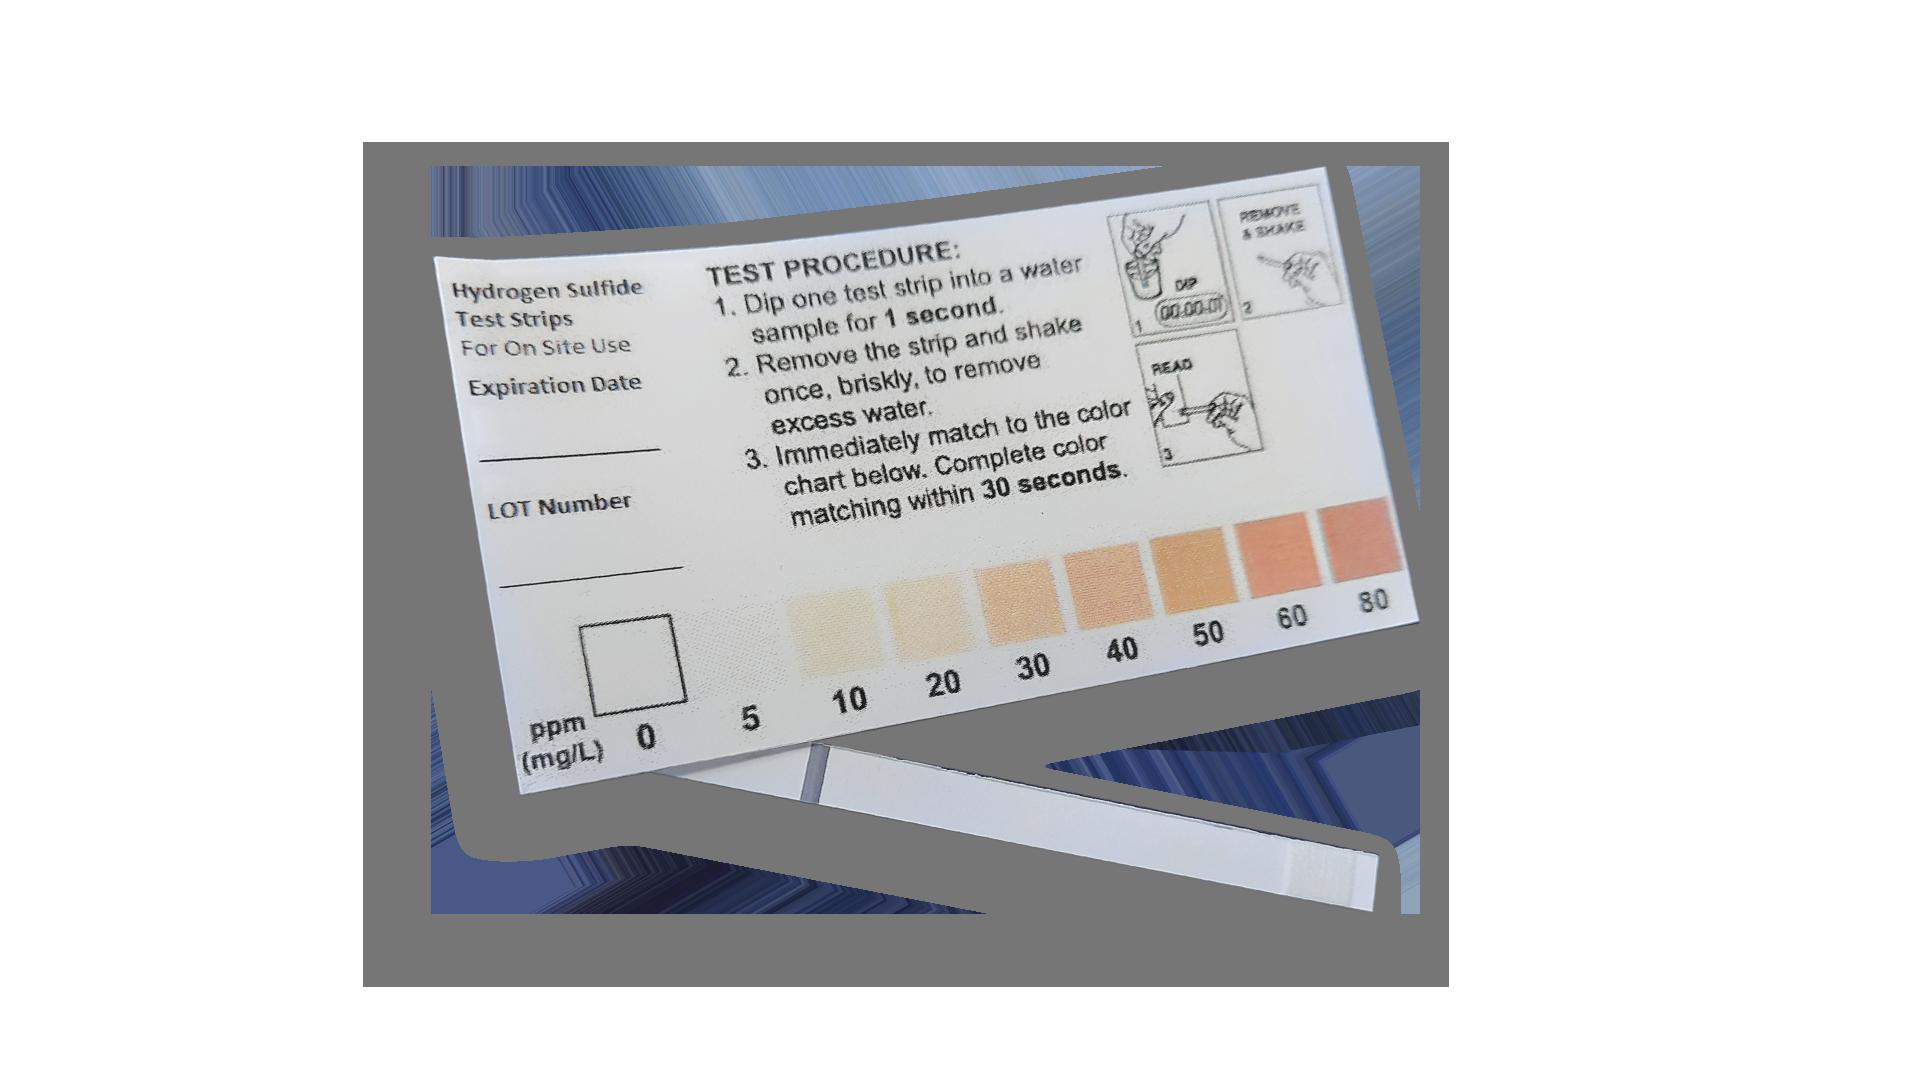 HydrogenSulfide-Test-Strip